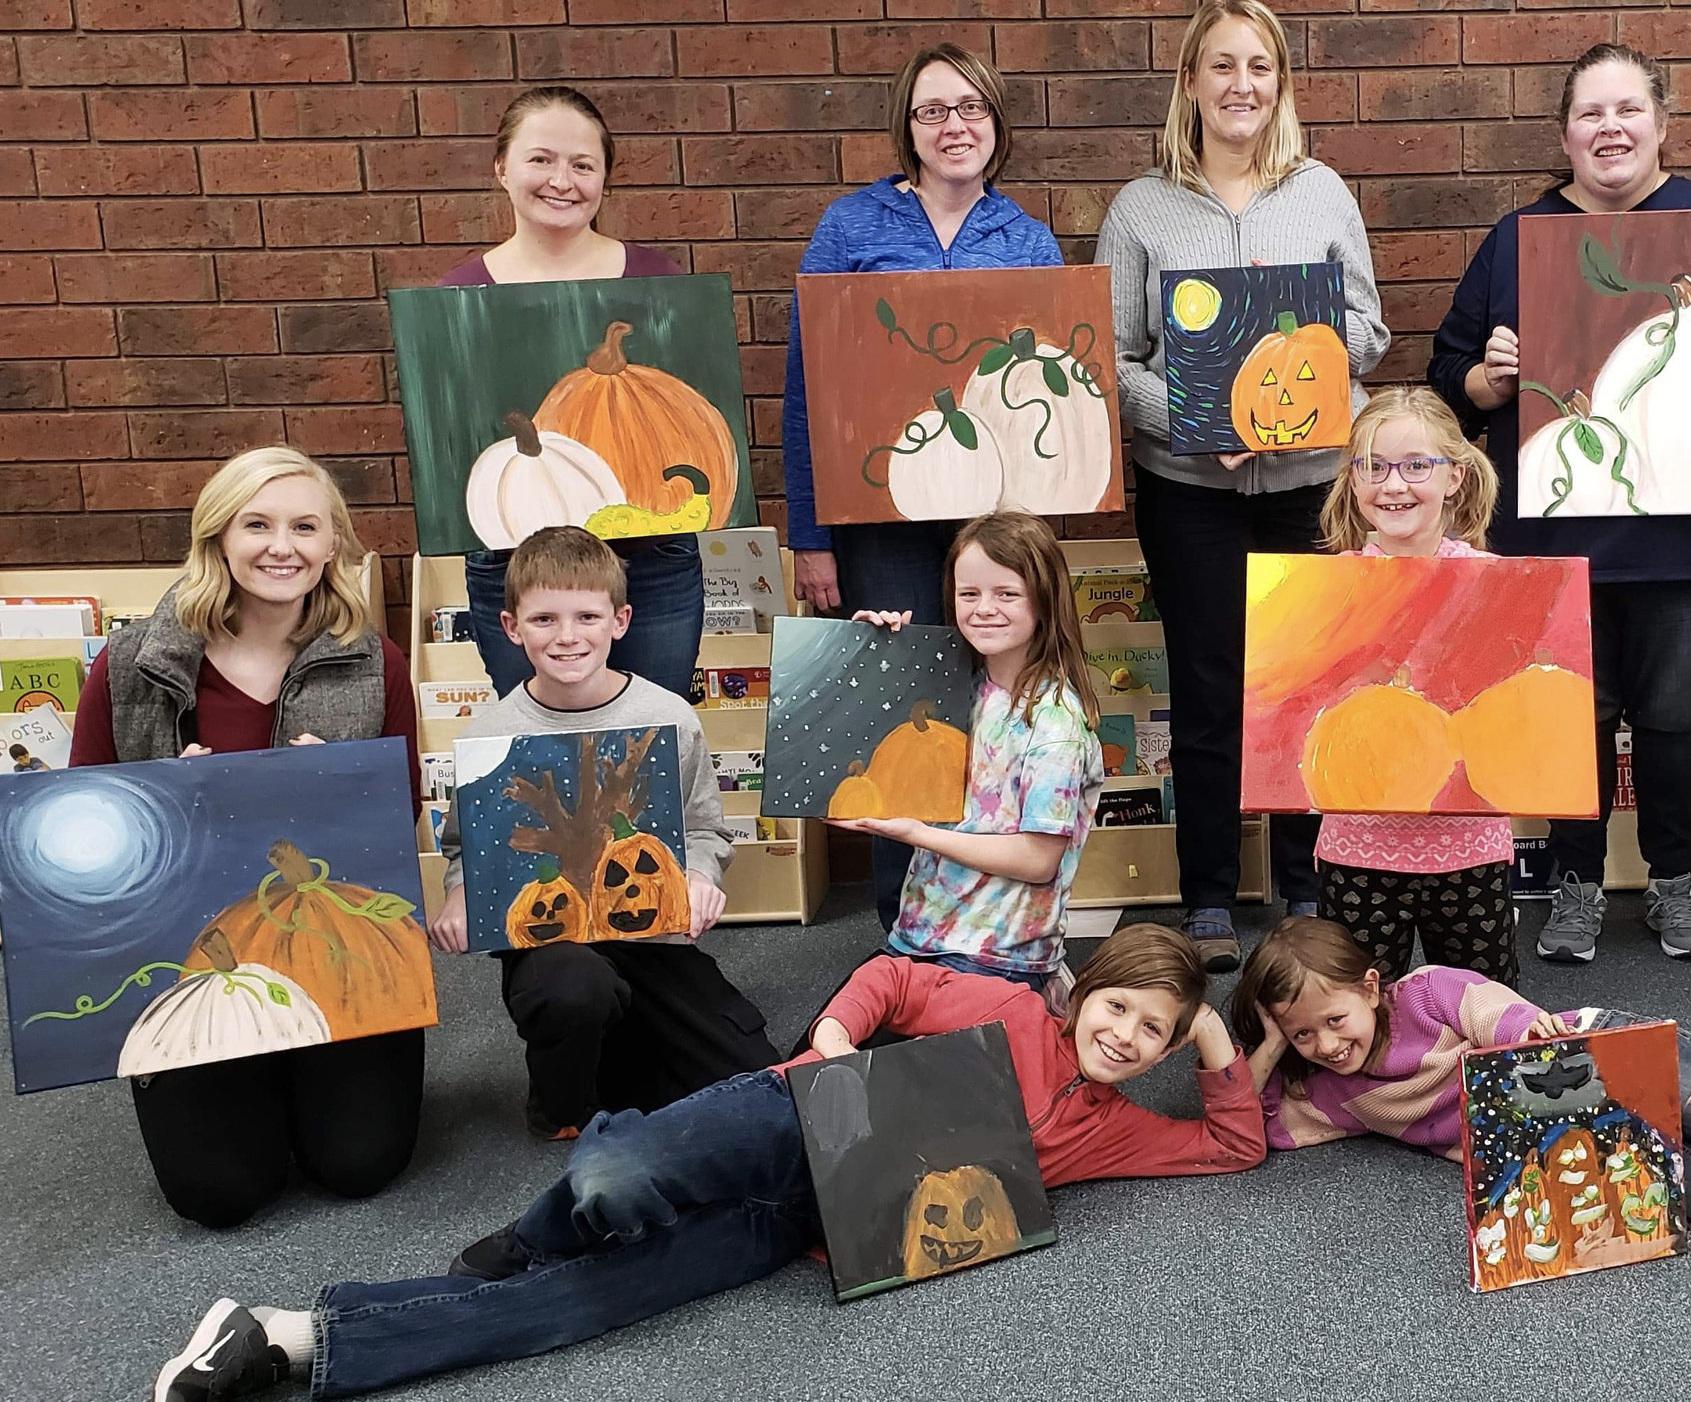 AUTUMN STILLER , UW-STOUT ART EDUCATION INTERNSHIPS: Canvas Creations - Family painting classes, UW-Stout Library and NAEA painting classes, UW-Stout library